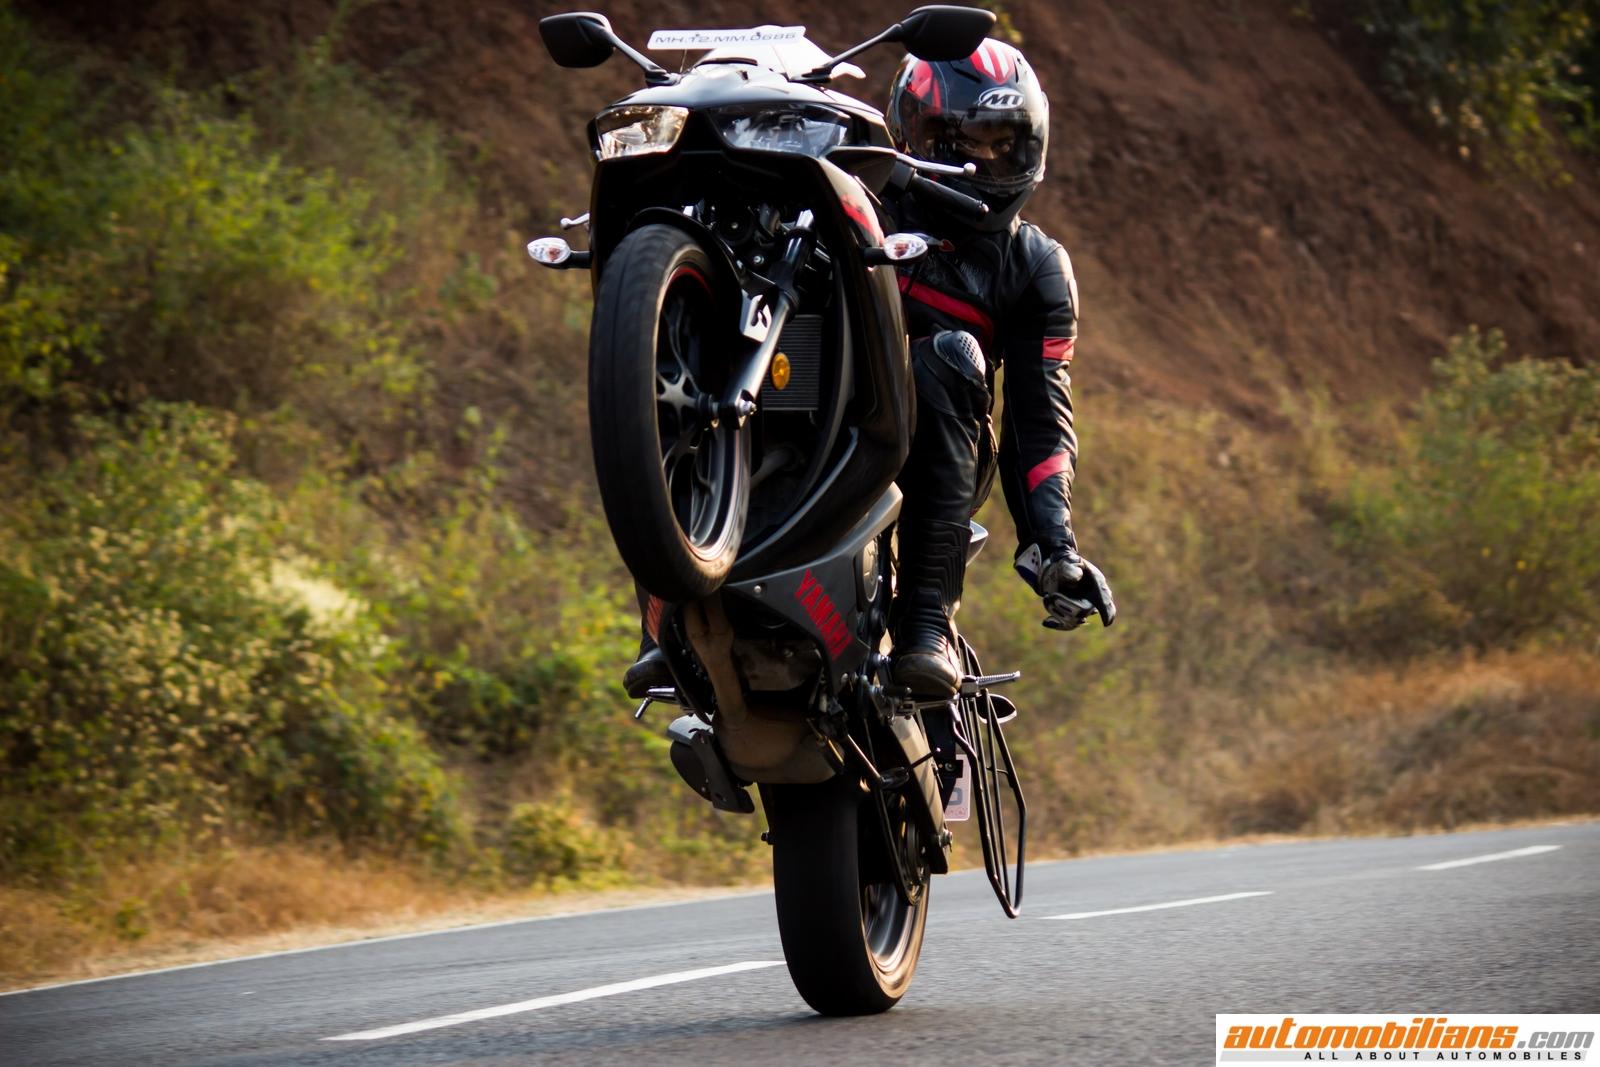 yamaha motorcycle 0 60 times quarter mile times yamaha